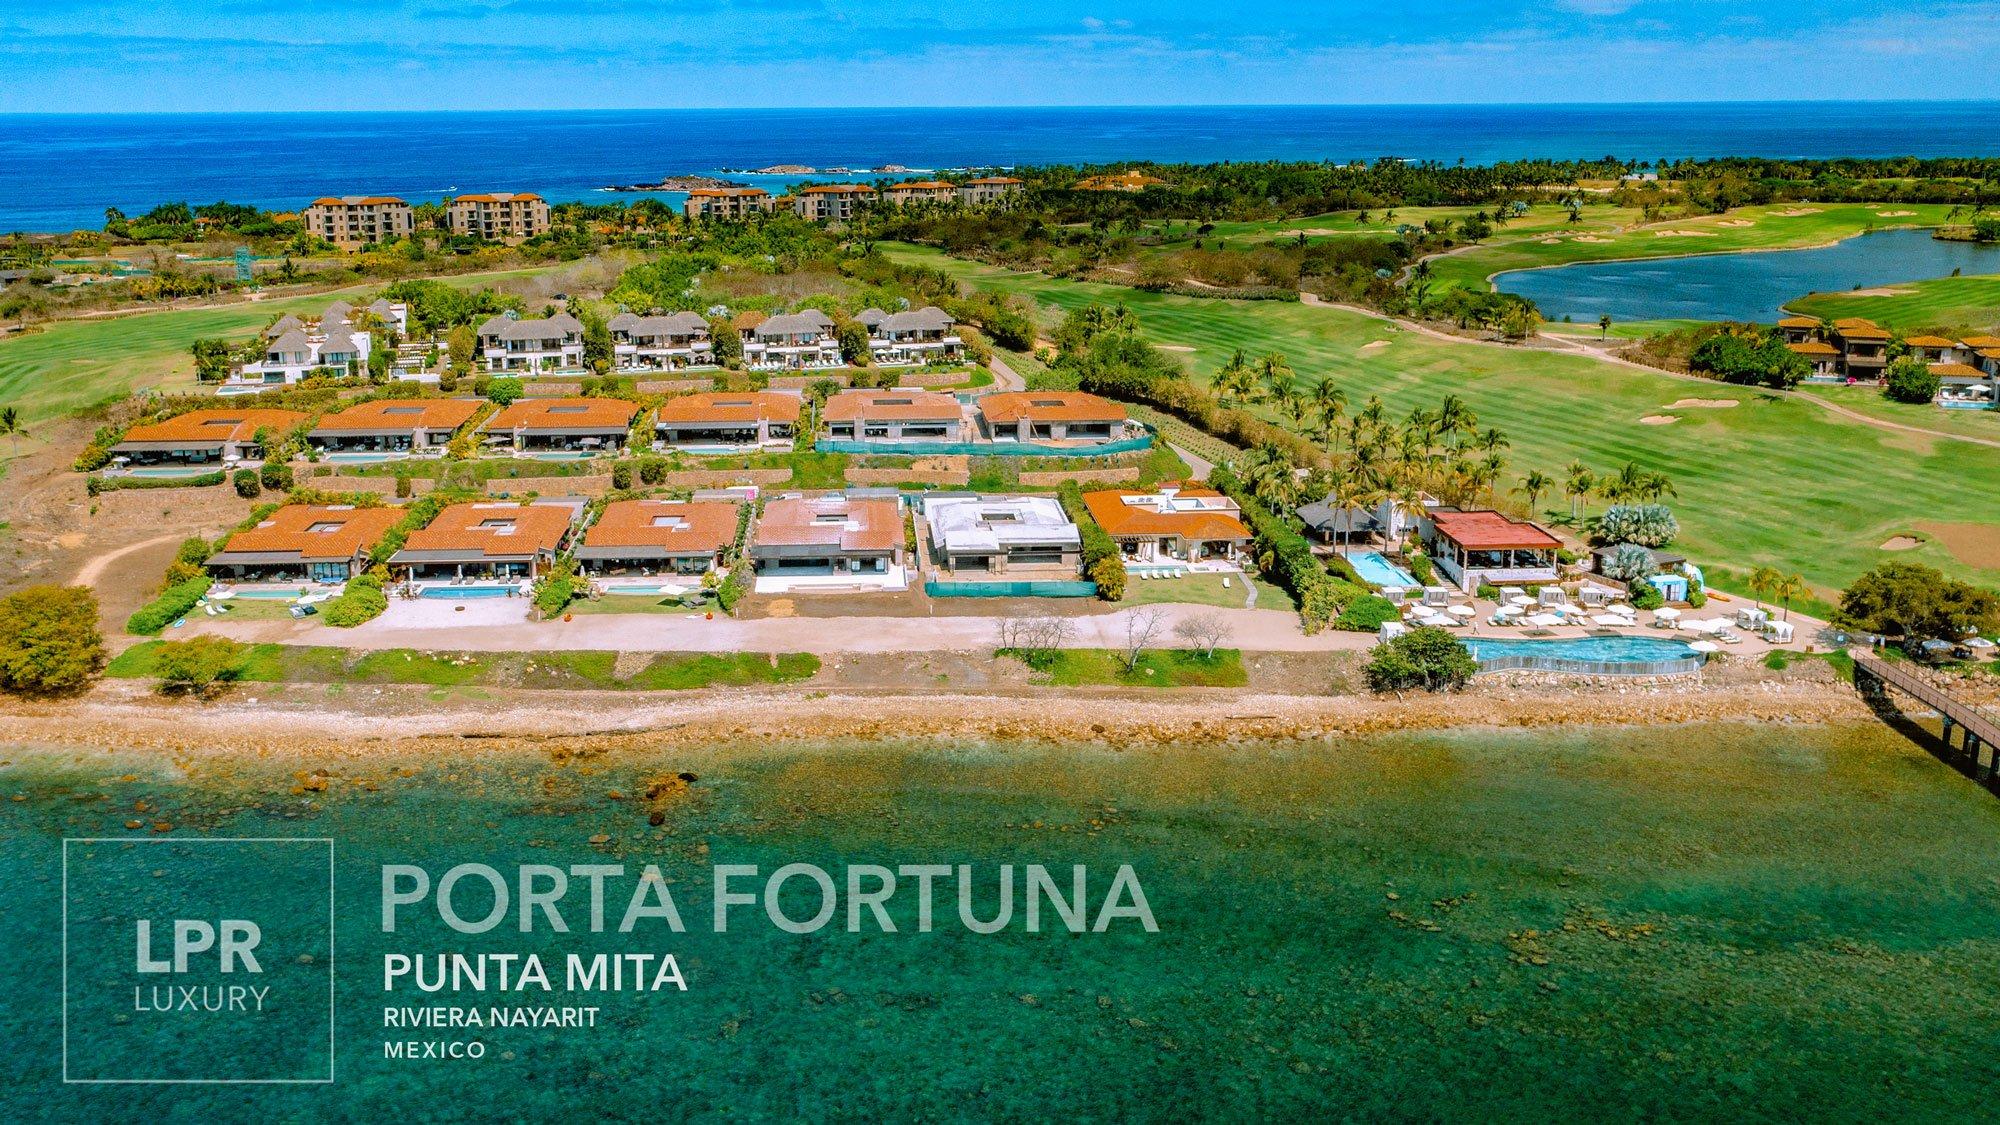 Villas at Porta Fortuna, Punta Mita Resort, Mexico - Luxury vacation rental villa at the Punta Mita Resort, Riviera Nayarit, Mexico